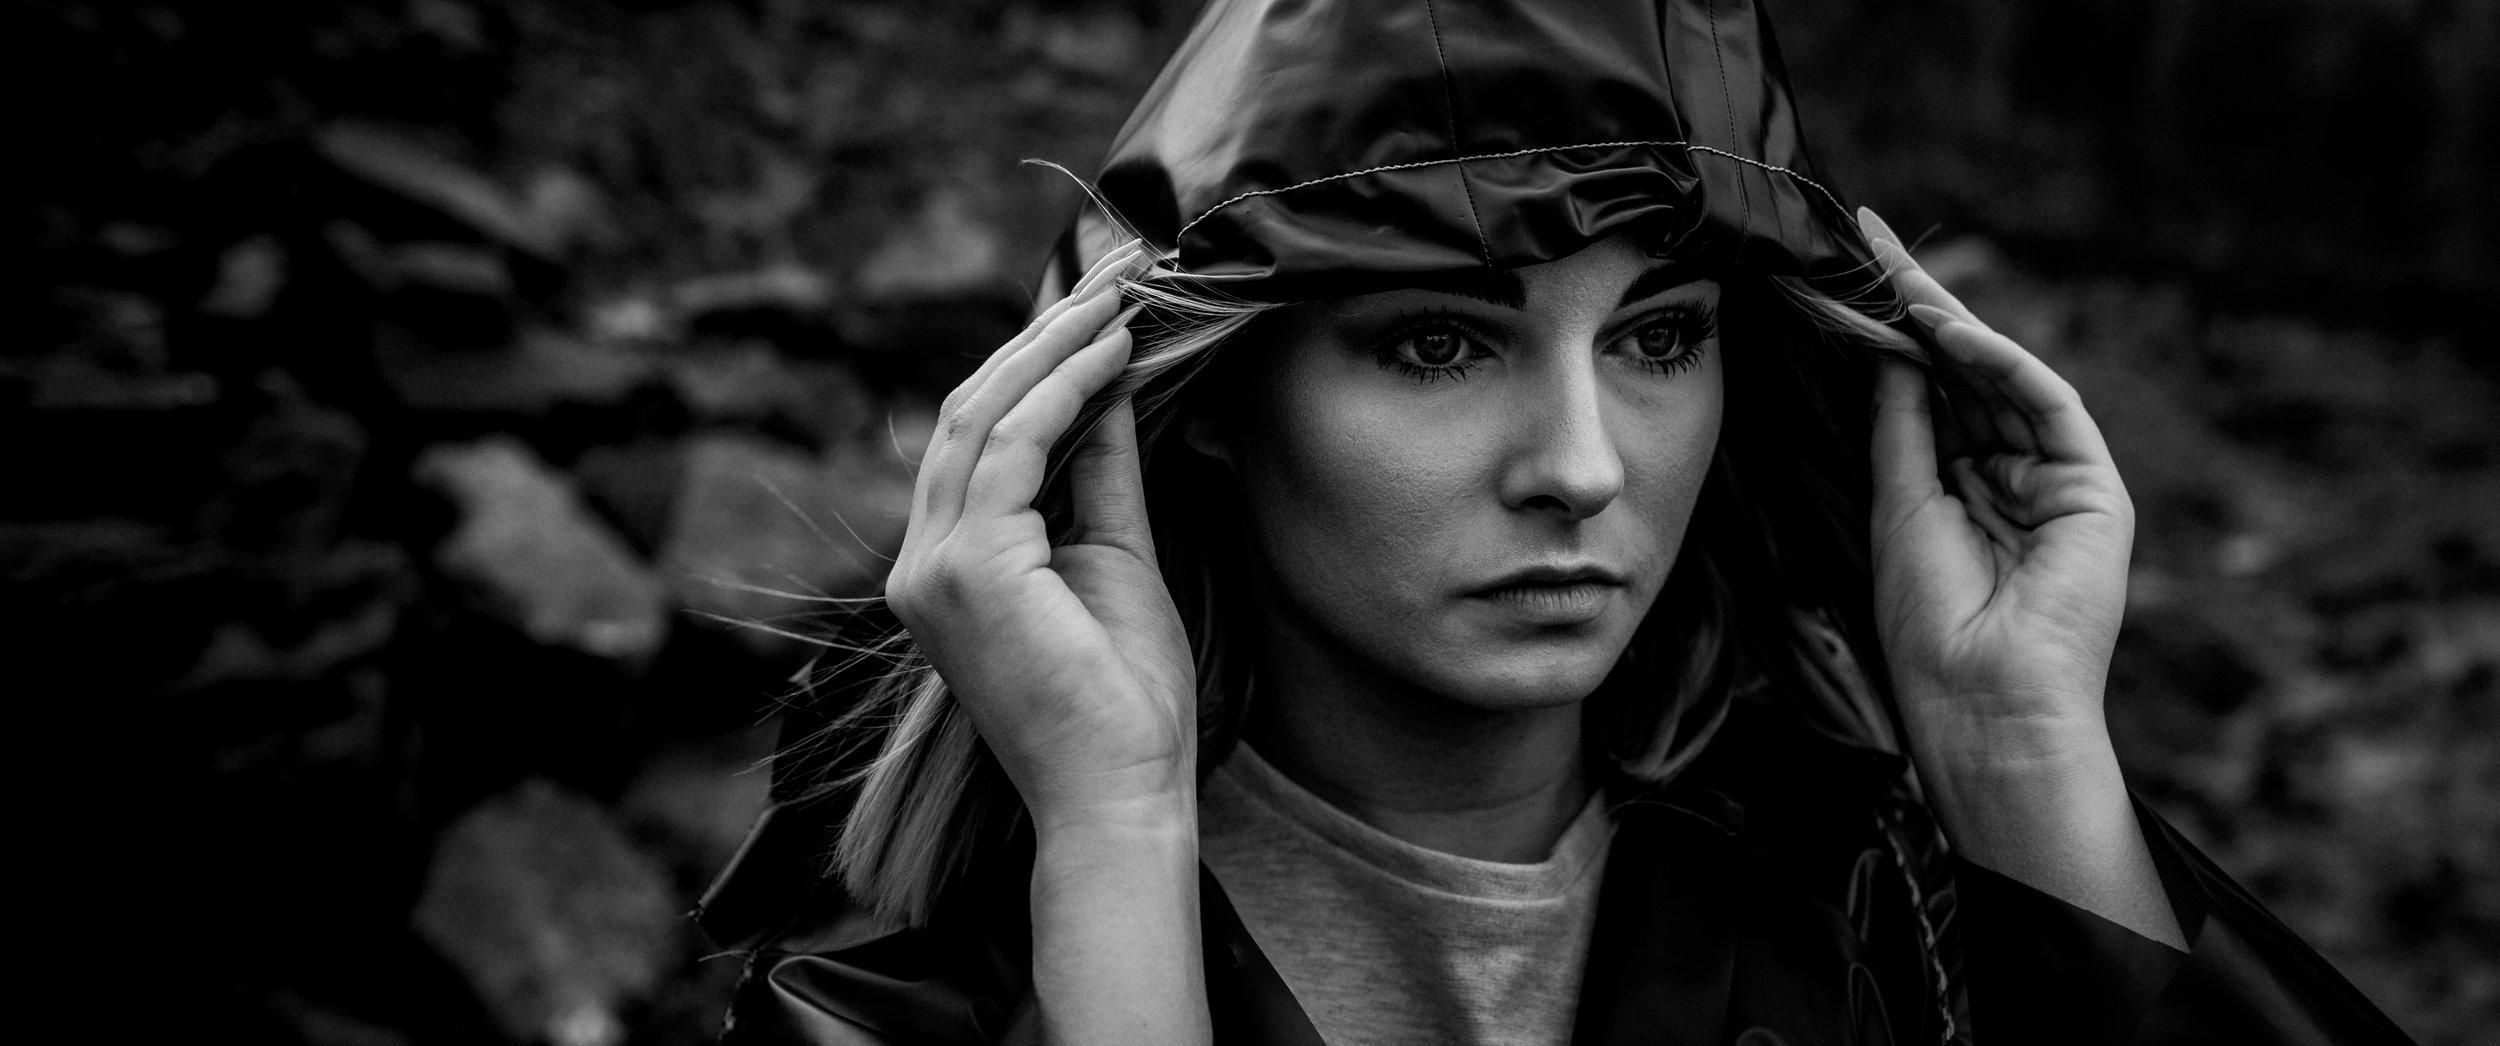 kalum carter fine art portrait photography bristol